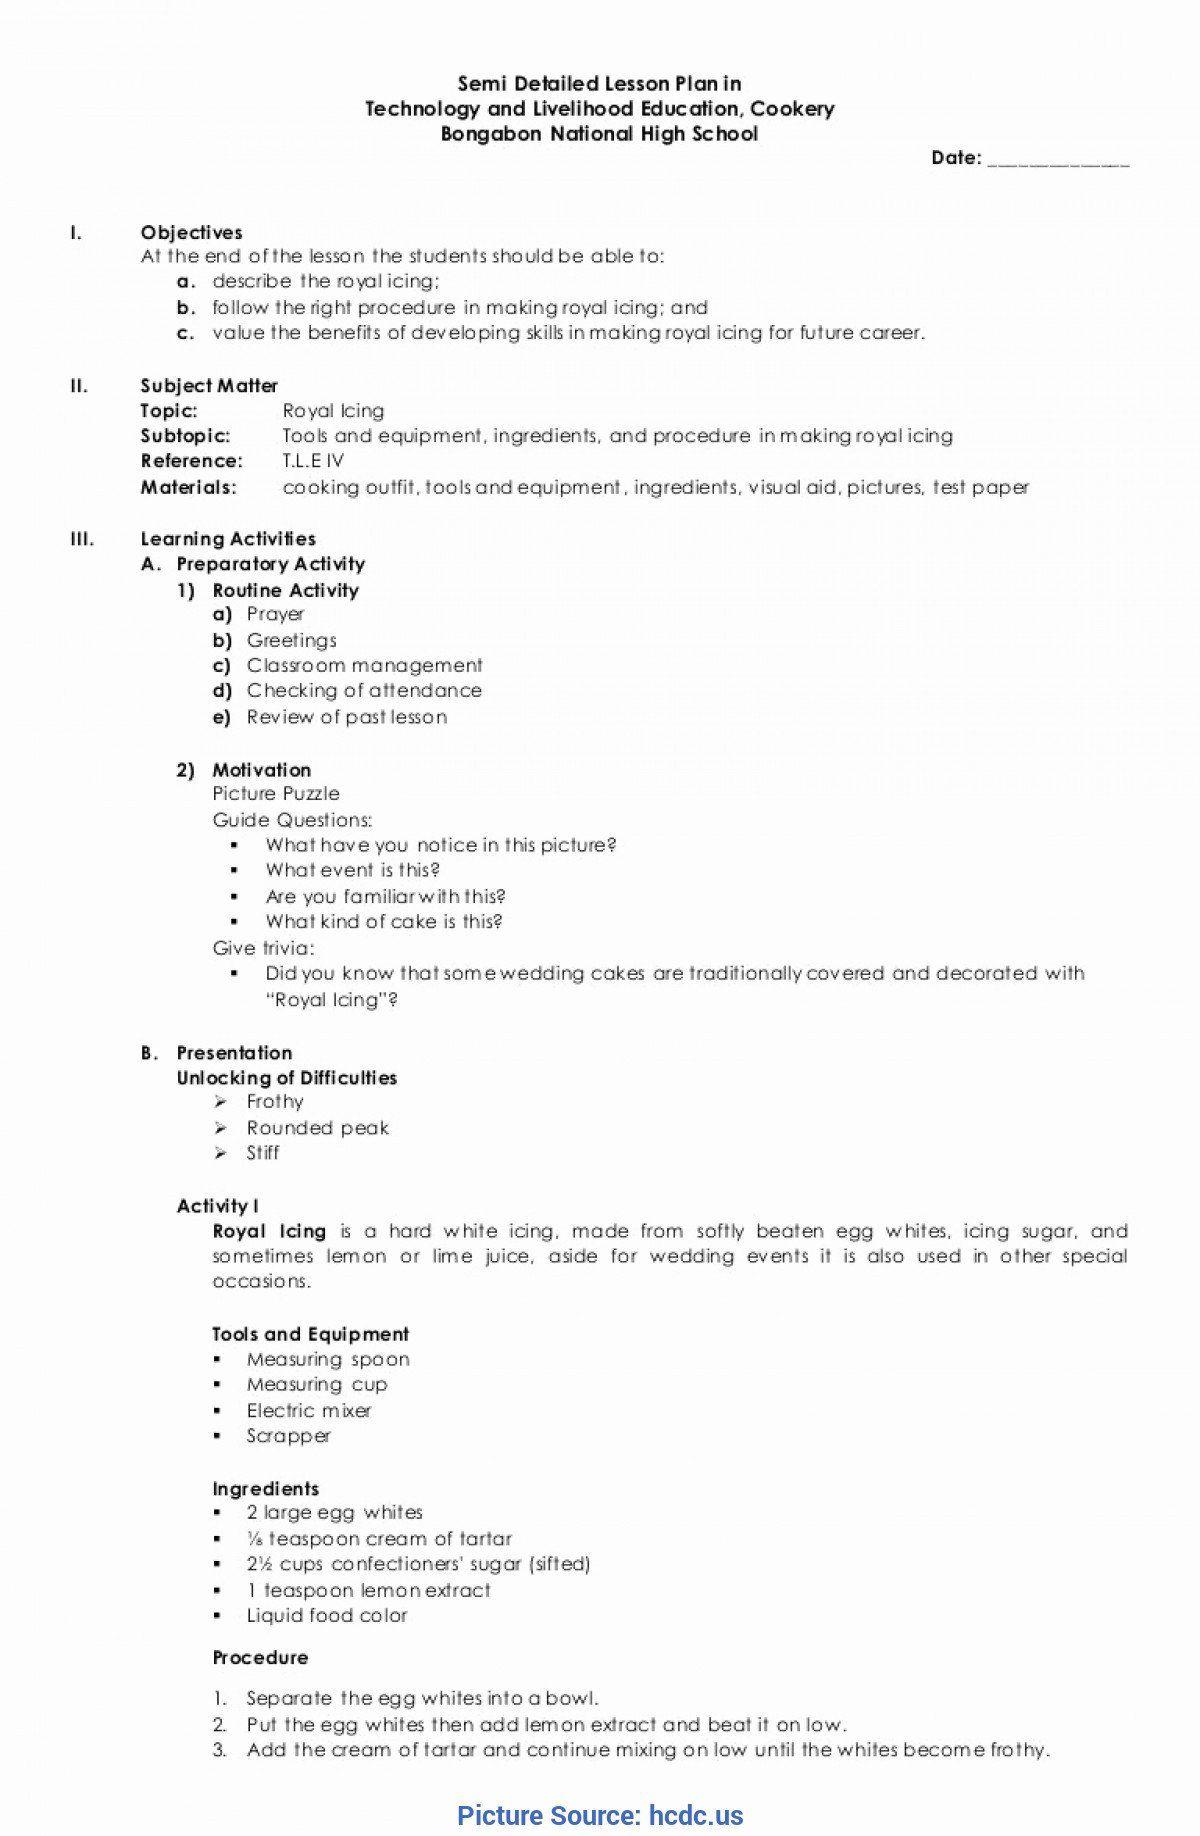 Economics Worksheets For High School Interesting Detailed